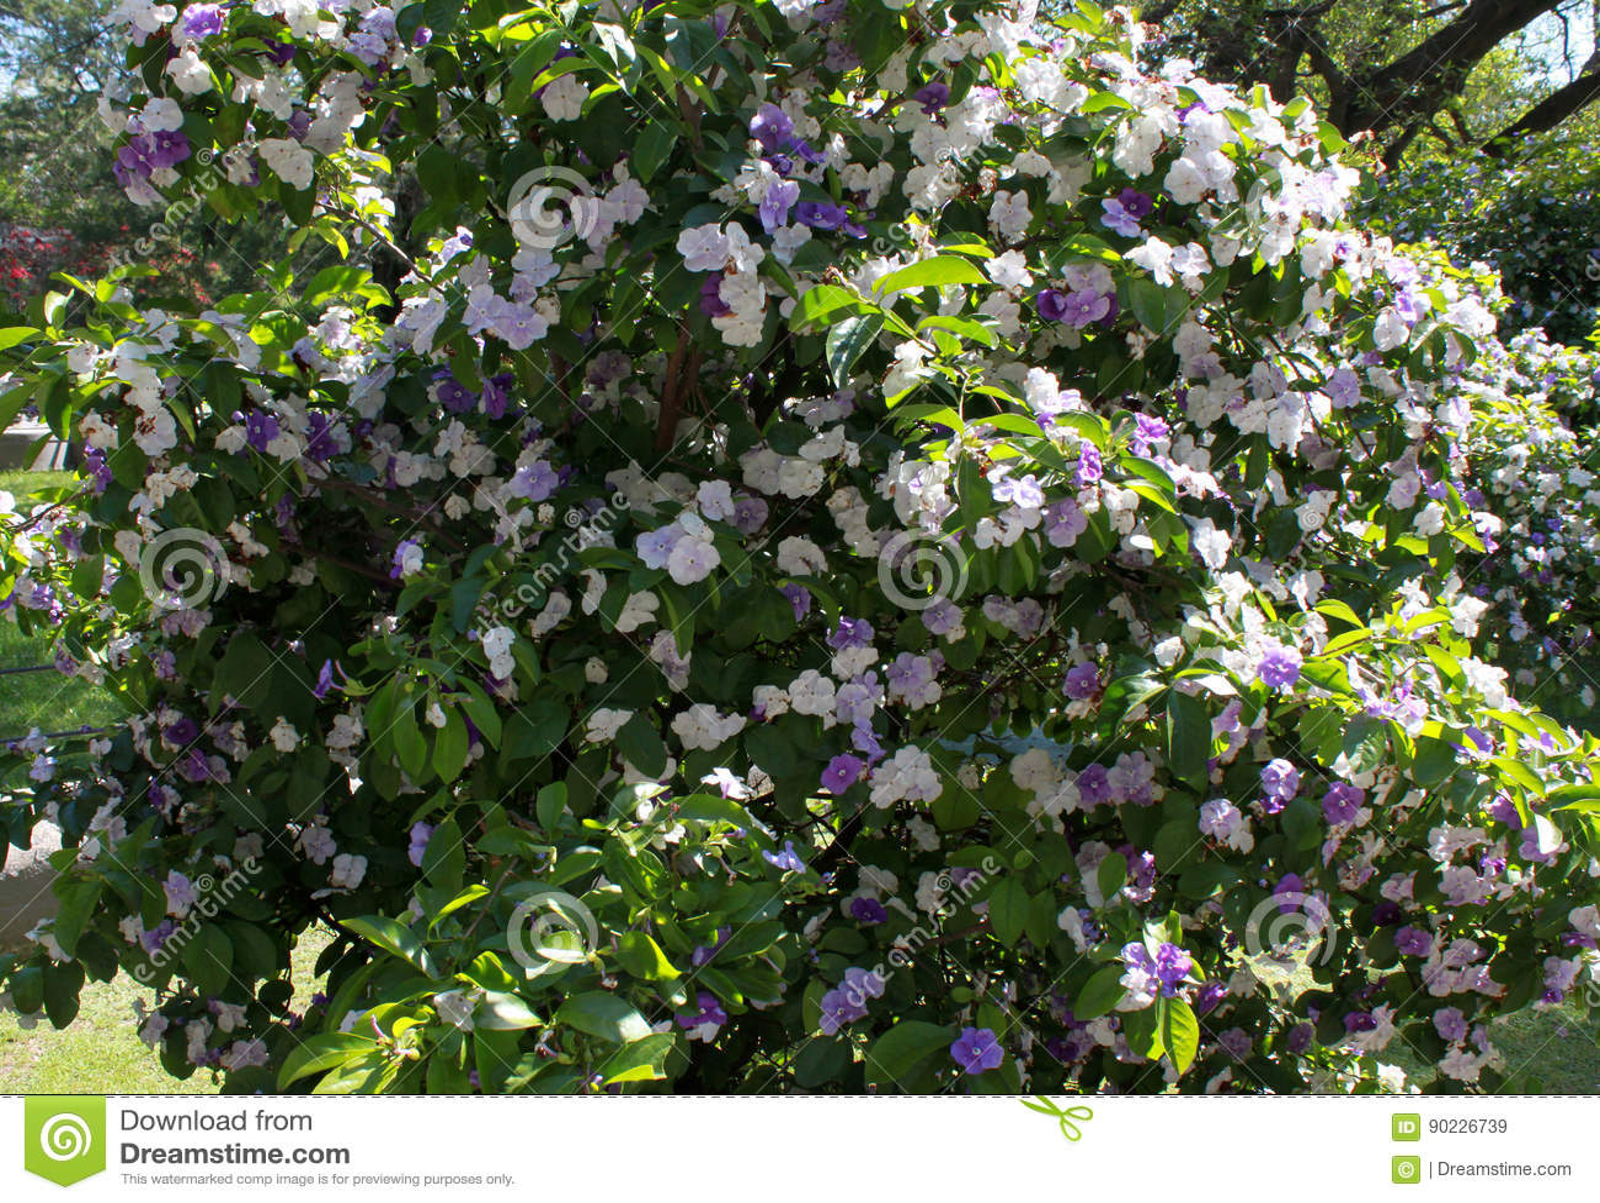 Fiori Bianchi Viola.Bush Con I Fiori Bianchi E Viola Di Brunfelsia Sulle Foglie Verdi